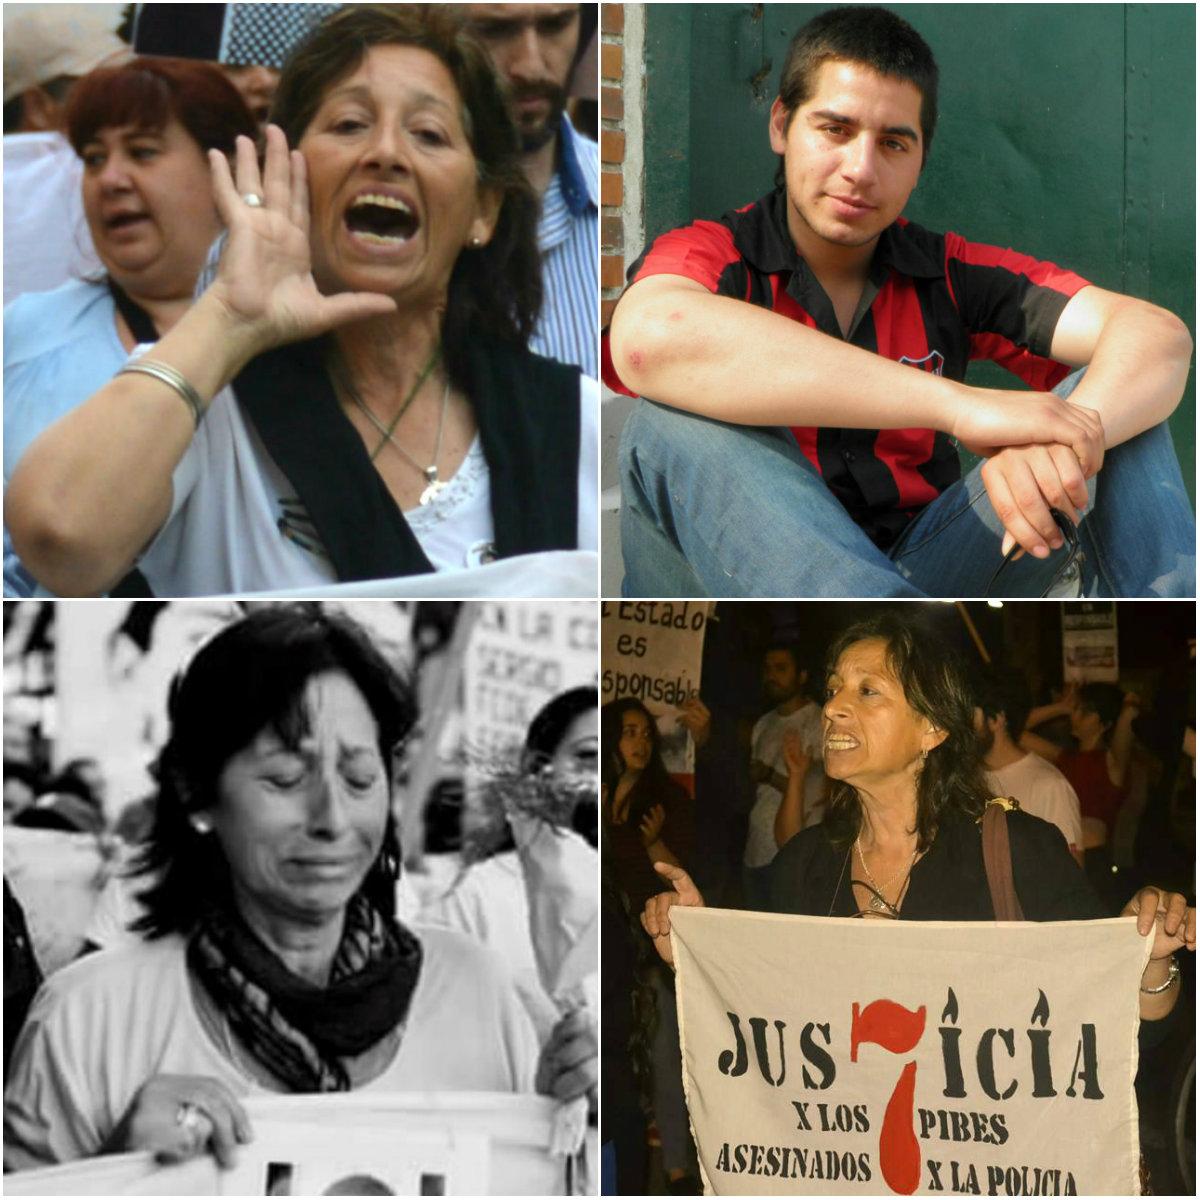 Fotos solidarias: Arriba, izquierda: Carmen Rodandelli. Arriba derecha: Rocío Gutiérrez. Abajo, derecha: Fotografia Doble A. Abajo, izquierda: Agustín Correa.